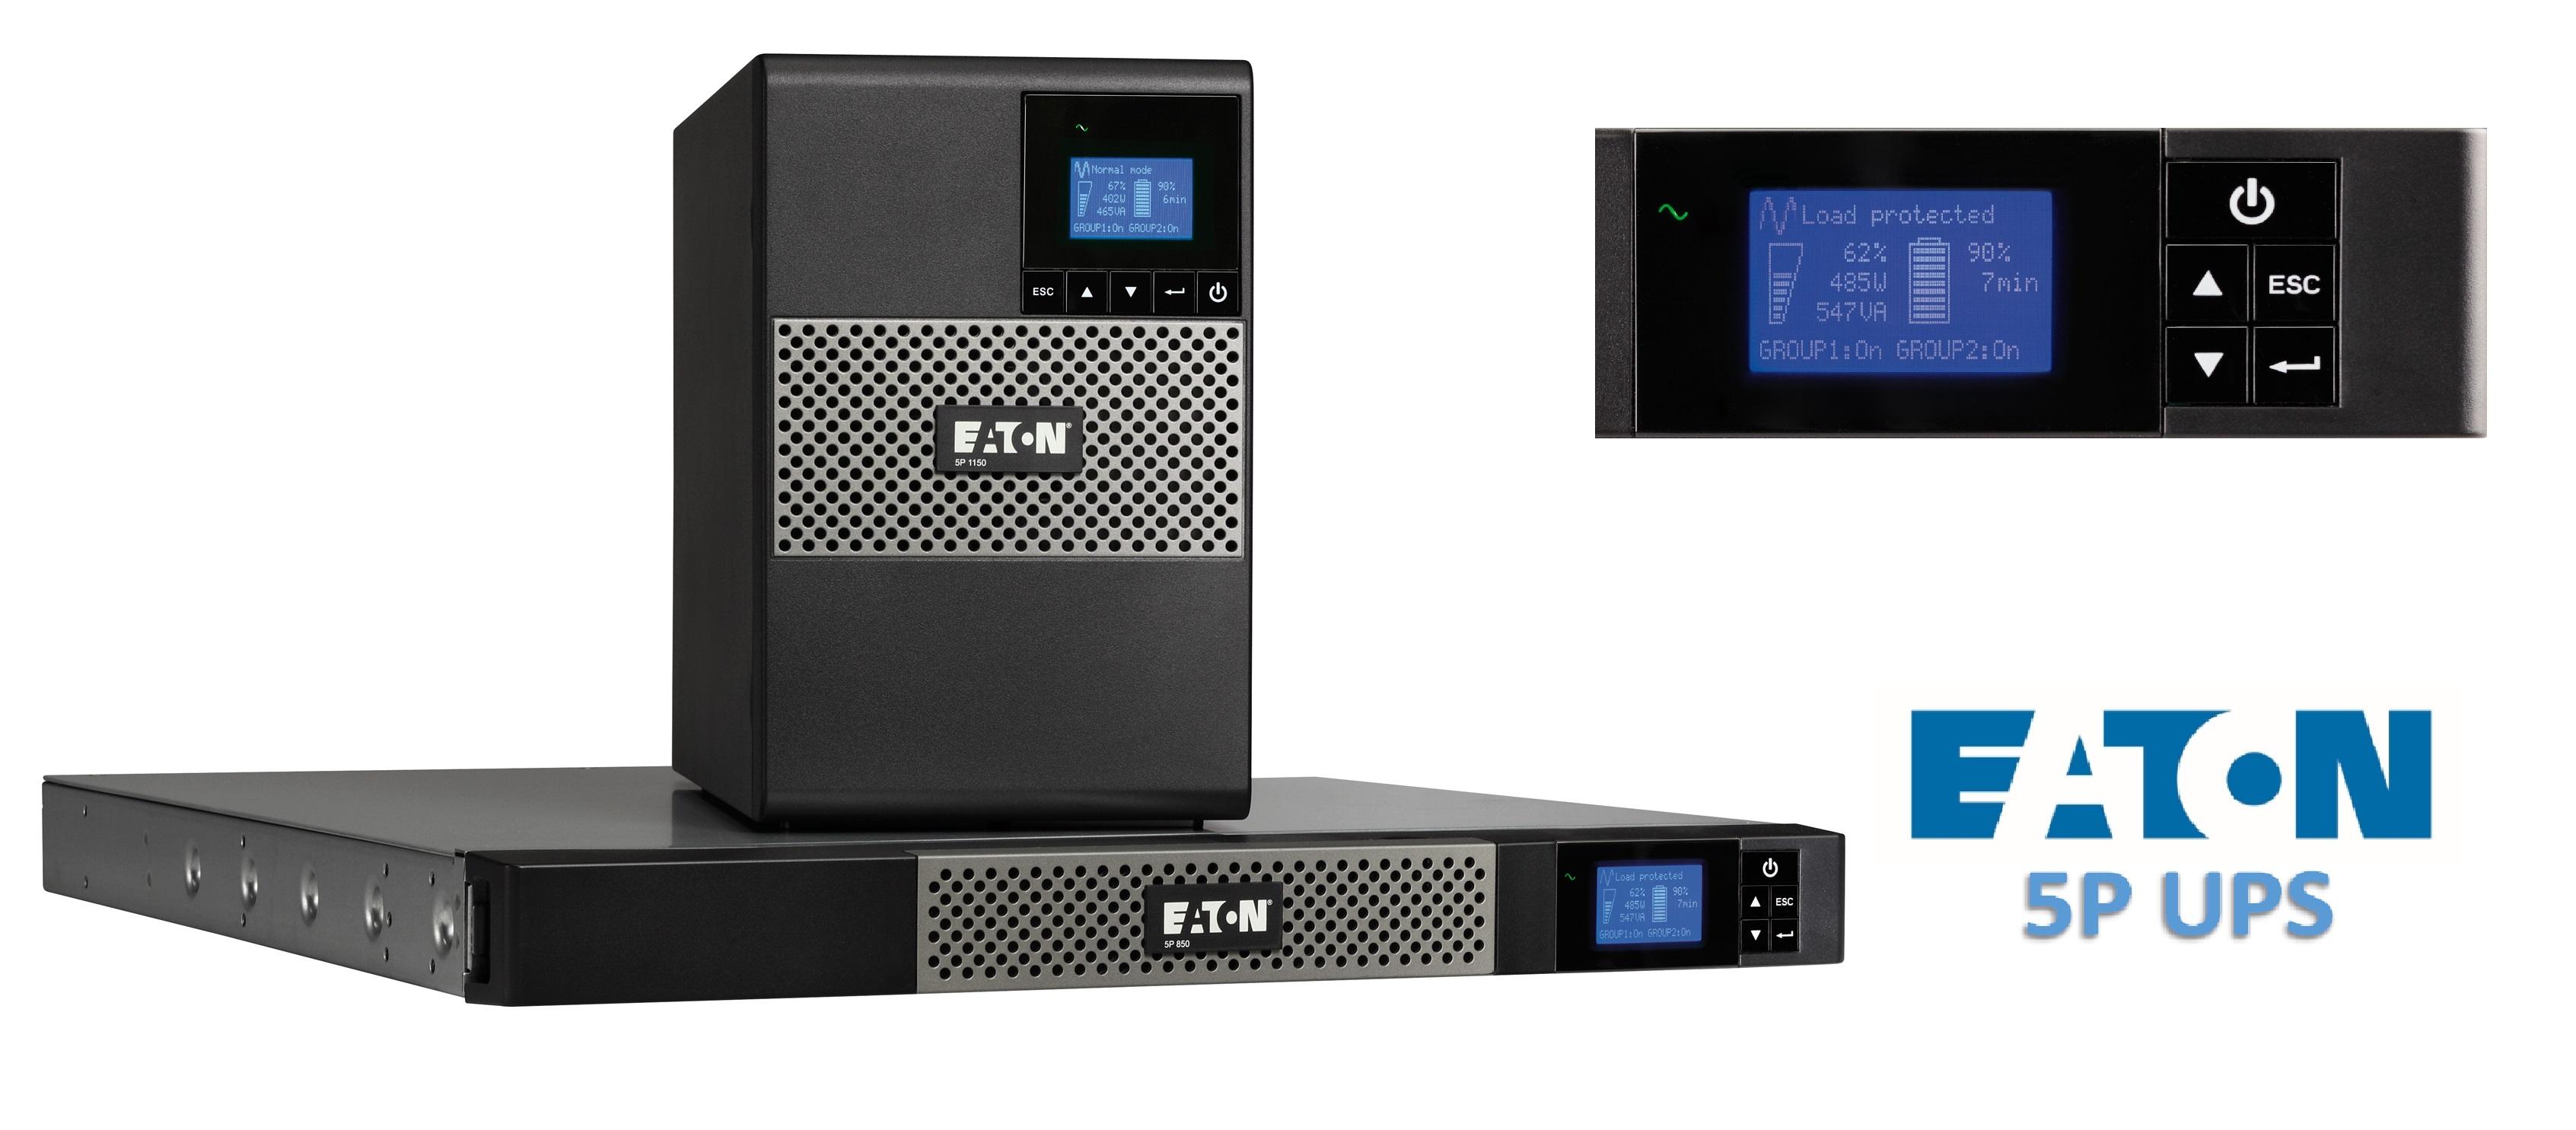 Eaton 5P UPS